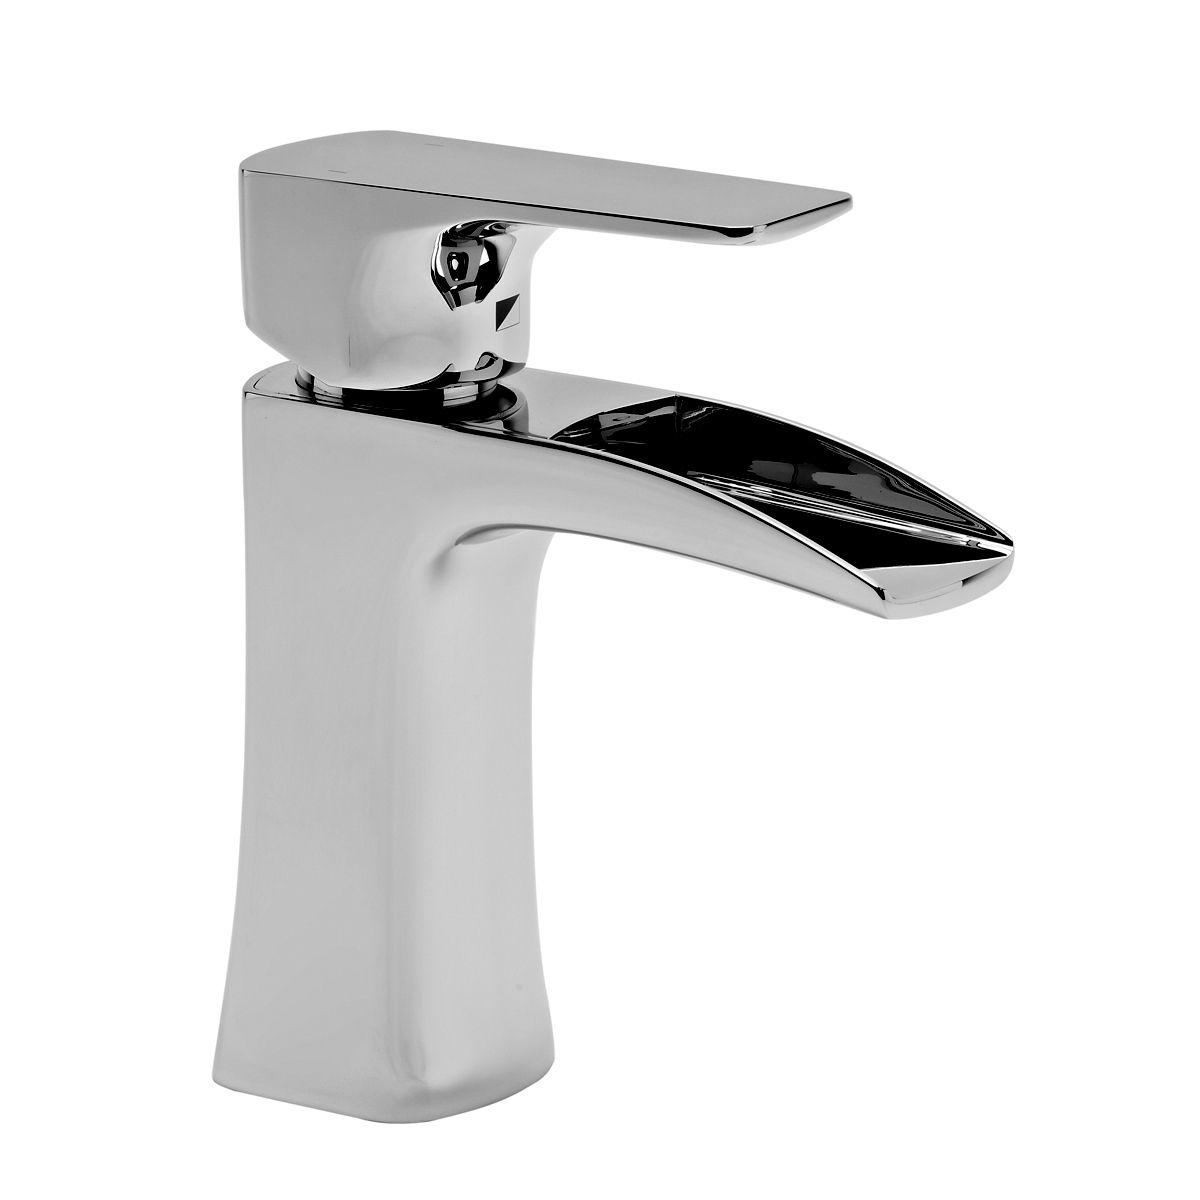 Roper Rhodes Sign Open Spout Basin Mixer Tap